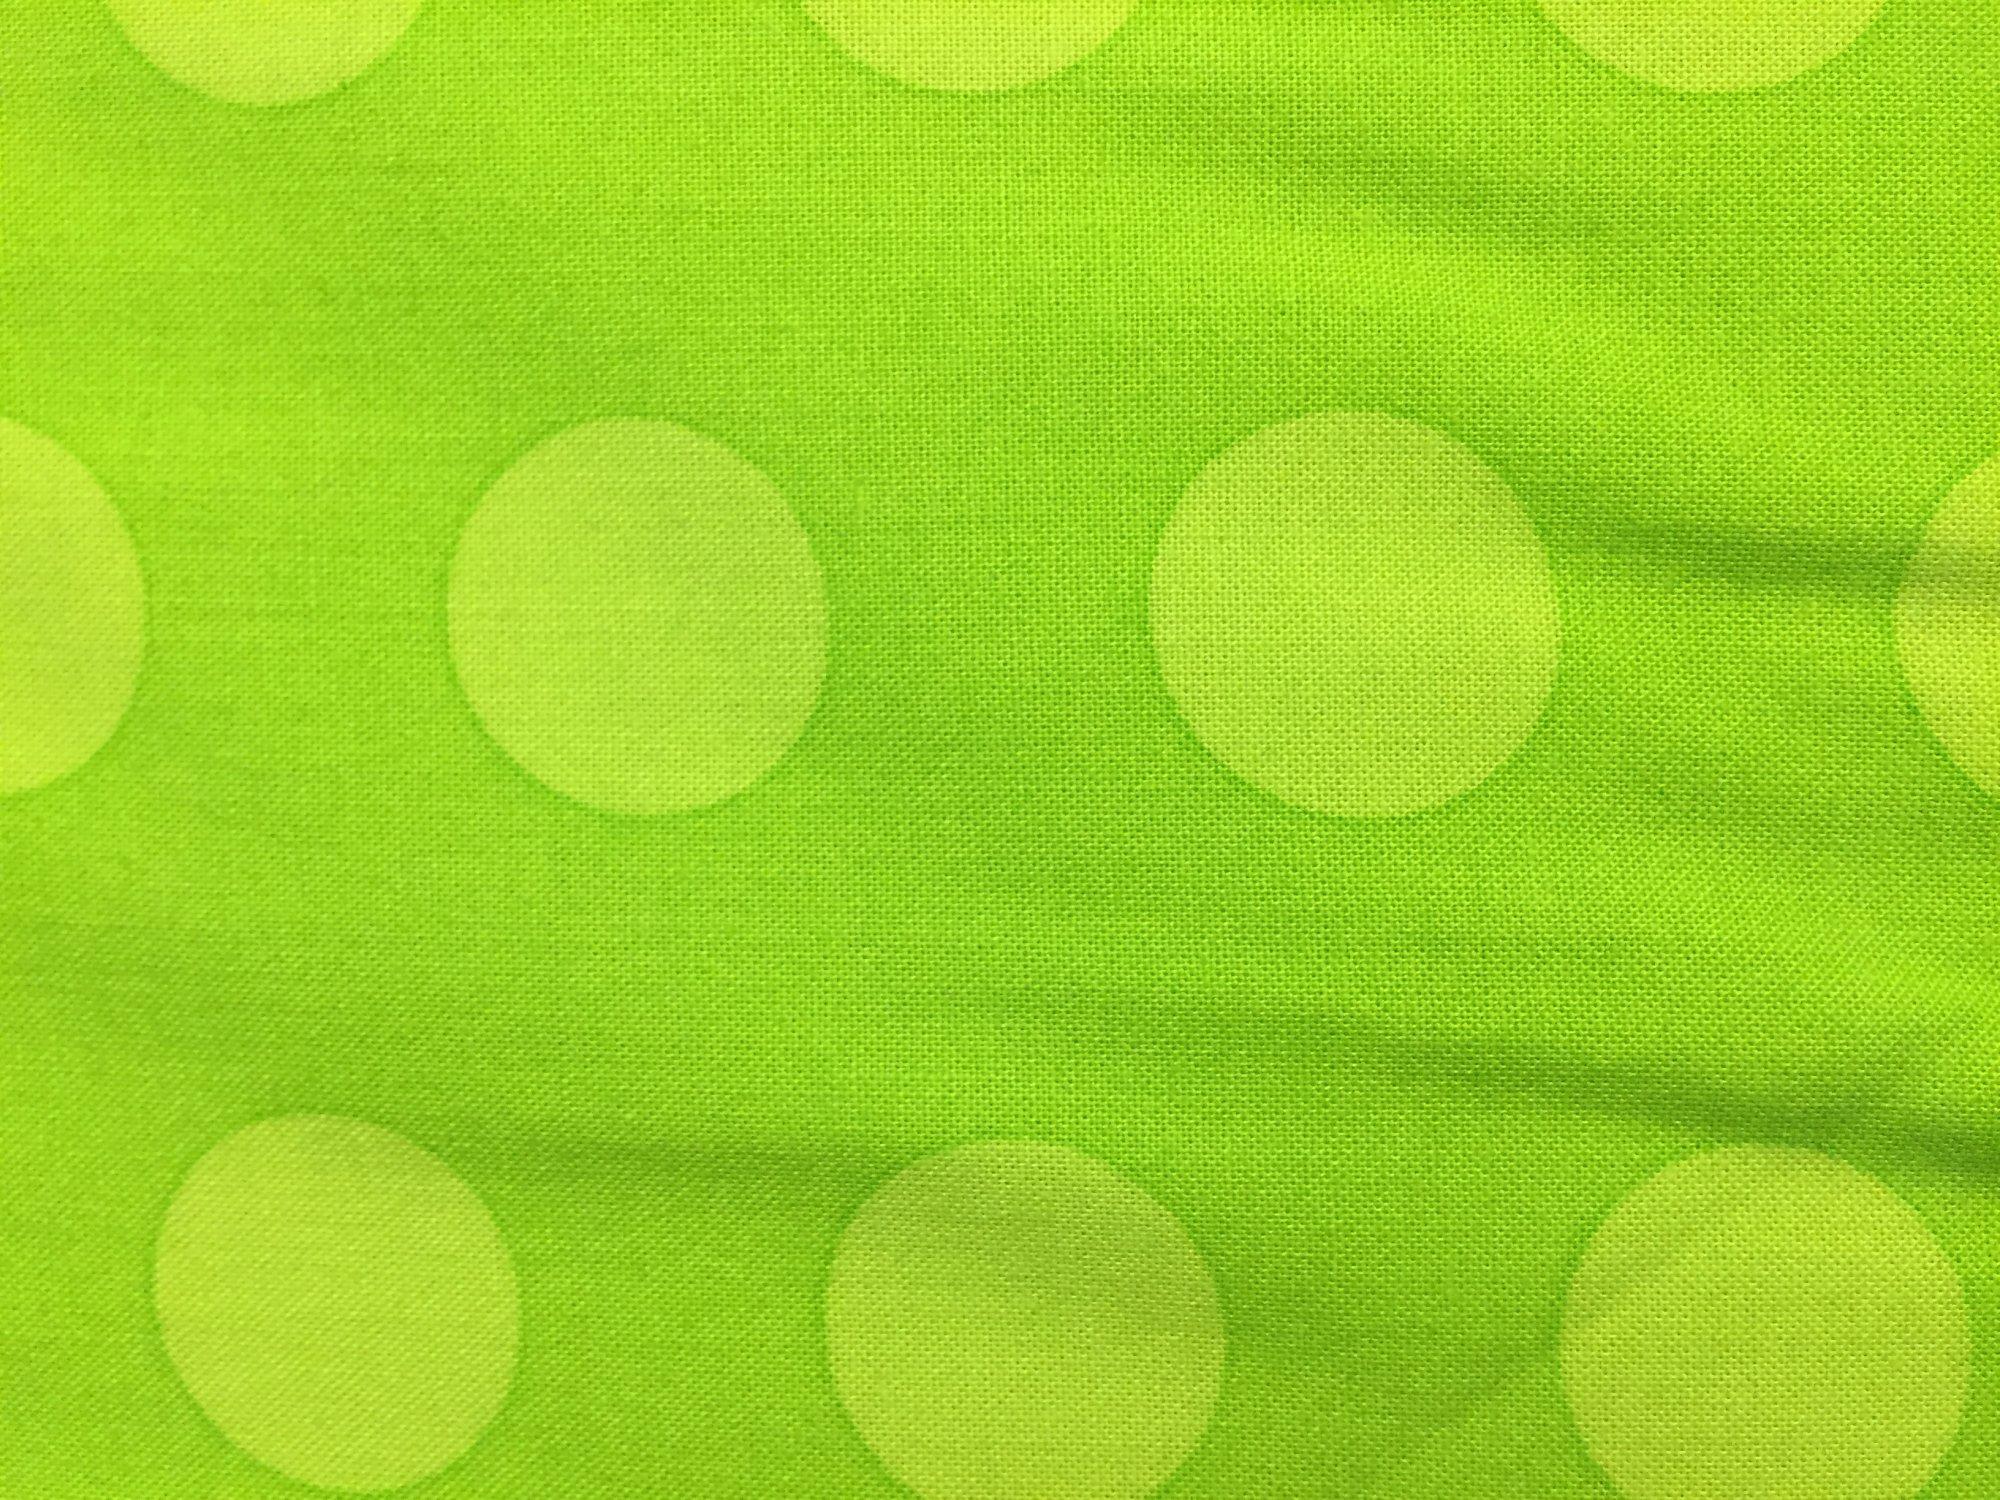 Happy Owl-o-Ween Green Dot